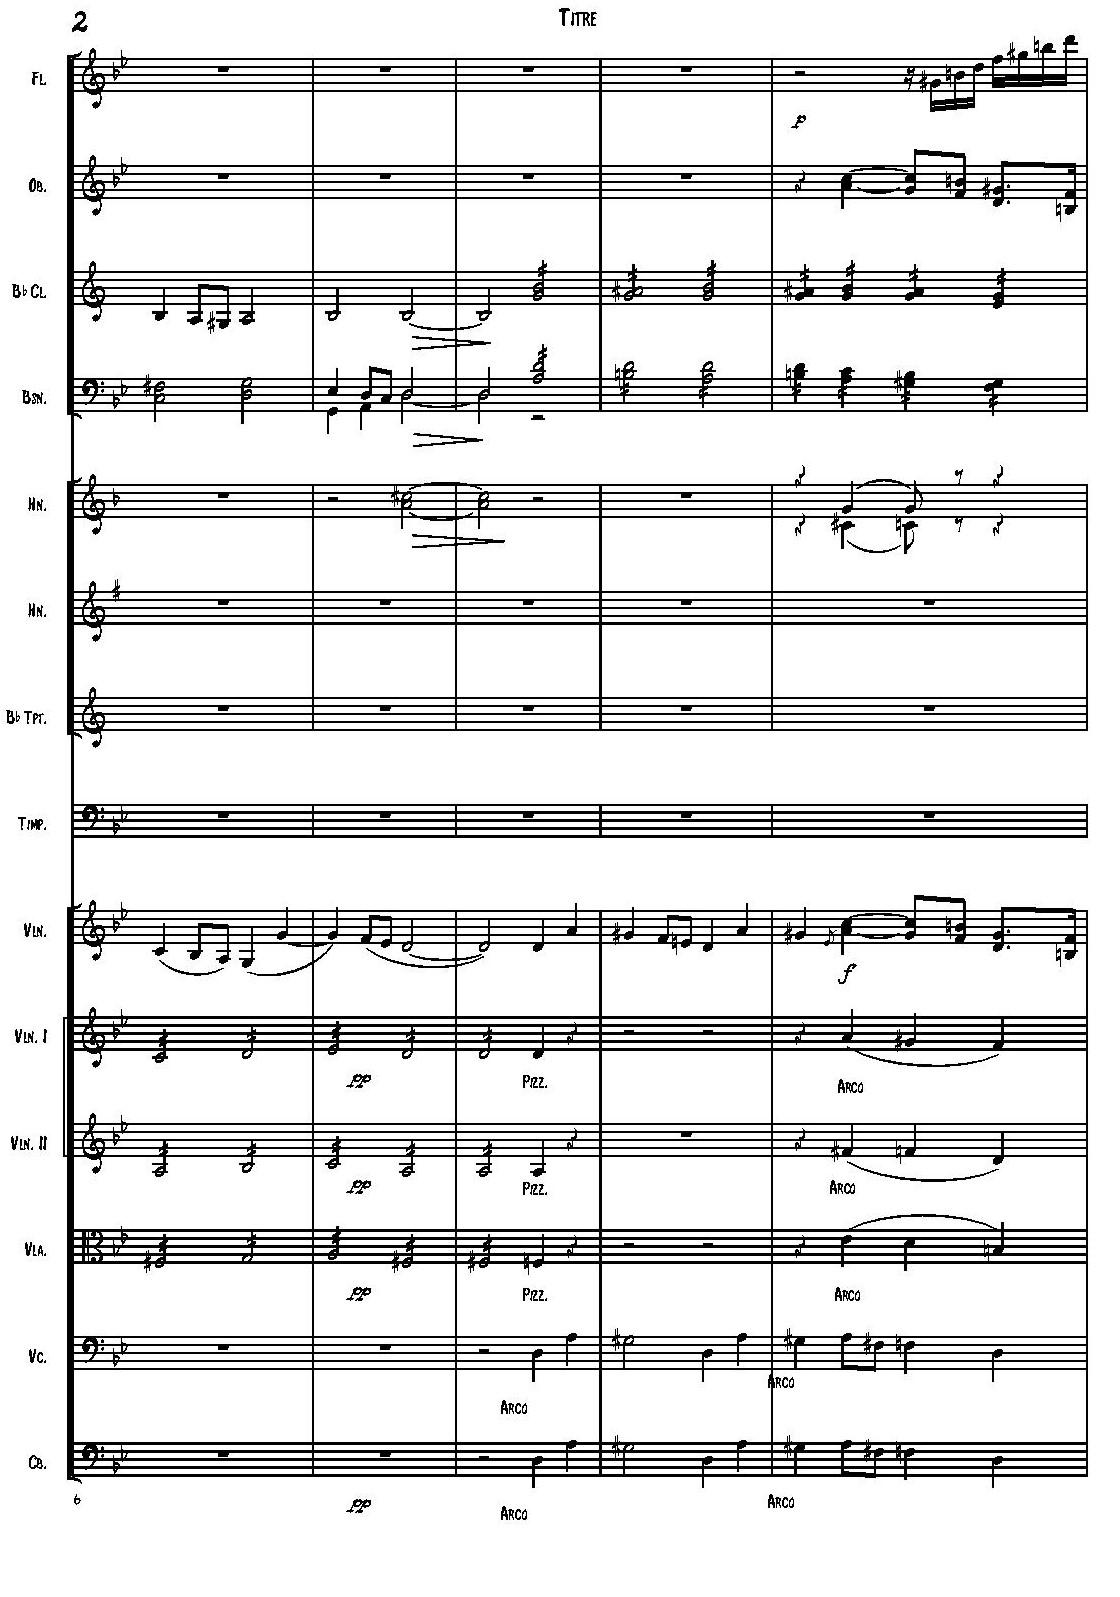 4 concerto2 (2)